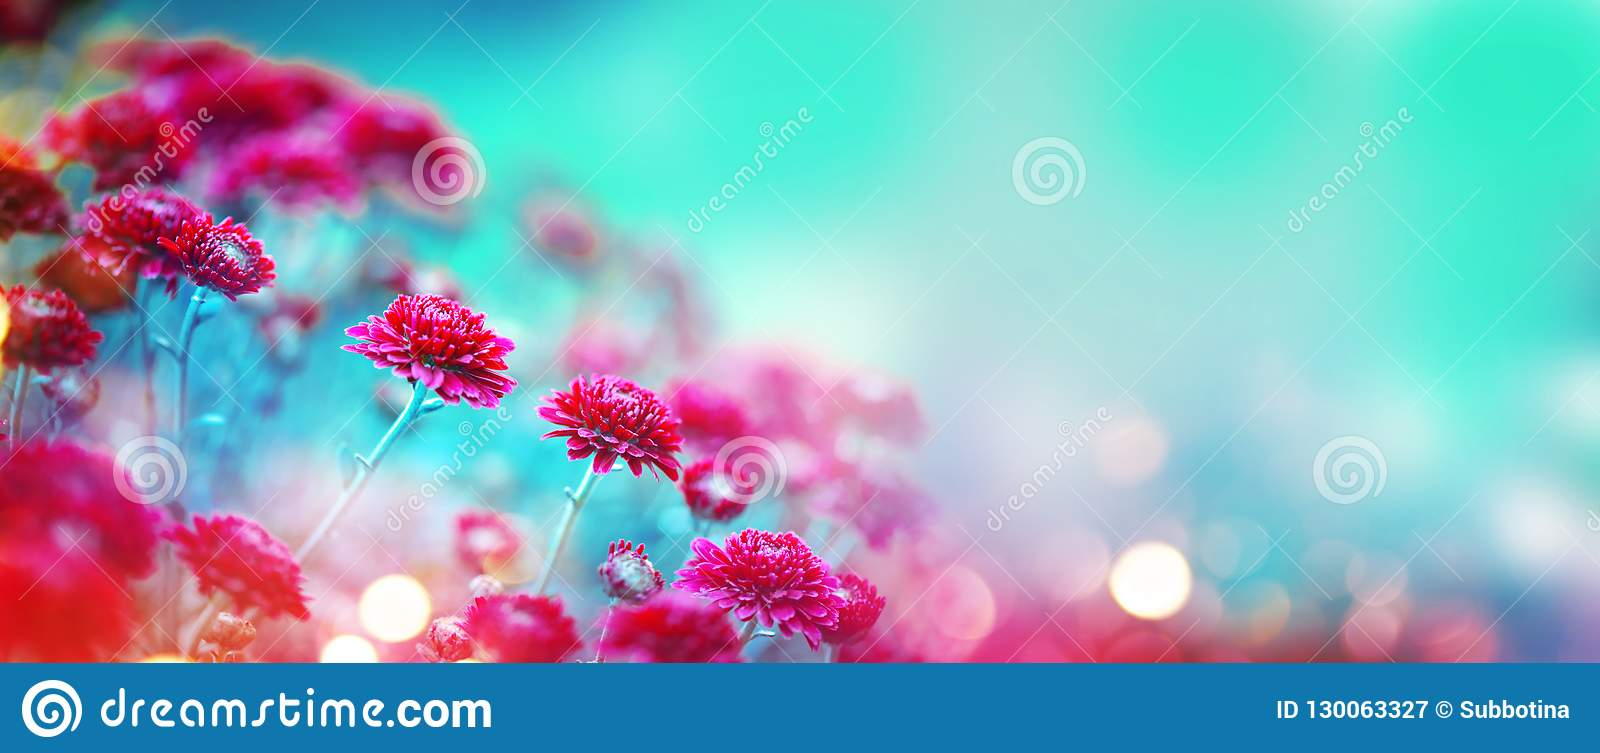 Chrysanthemum flowers blooming in a garden. Beauty autumn flowers